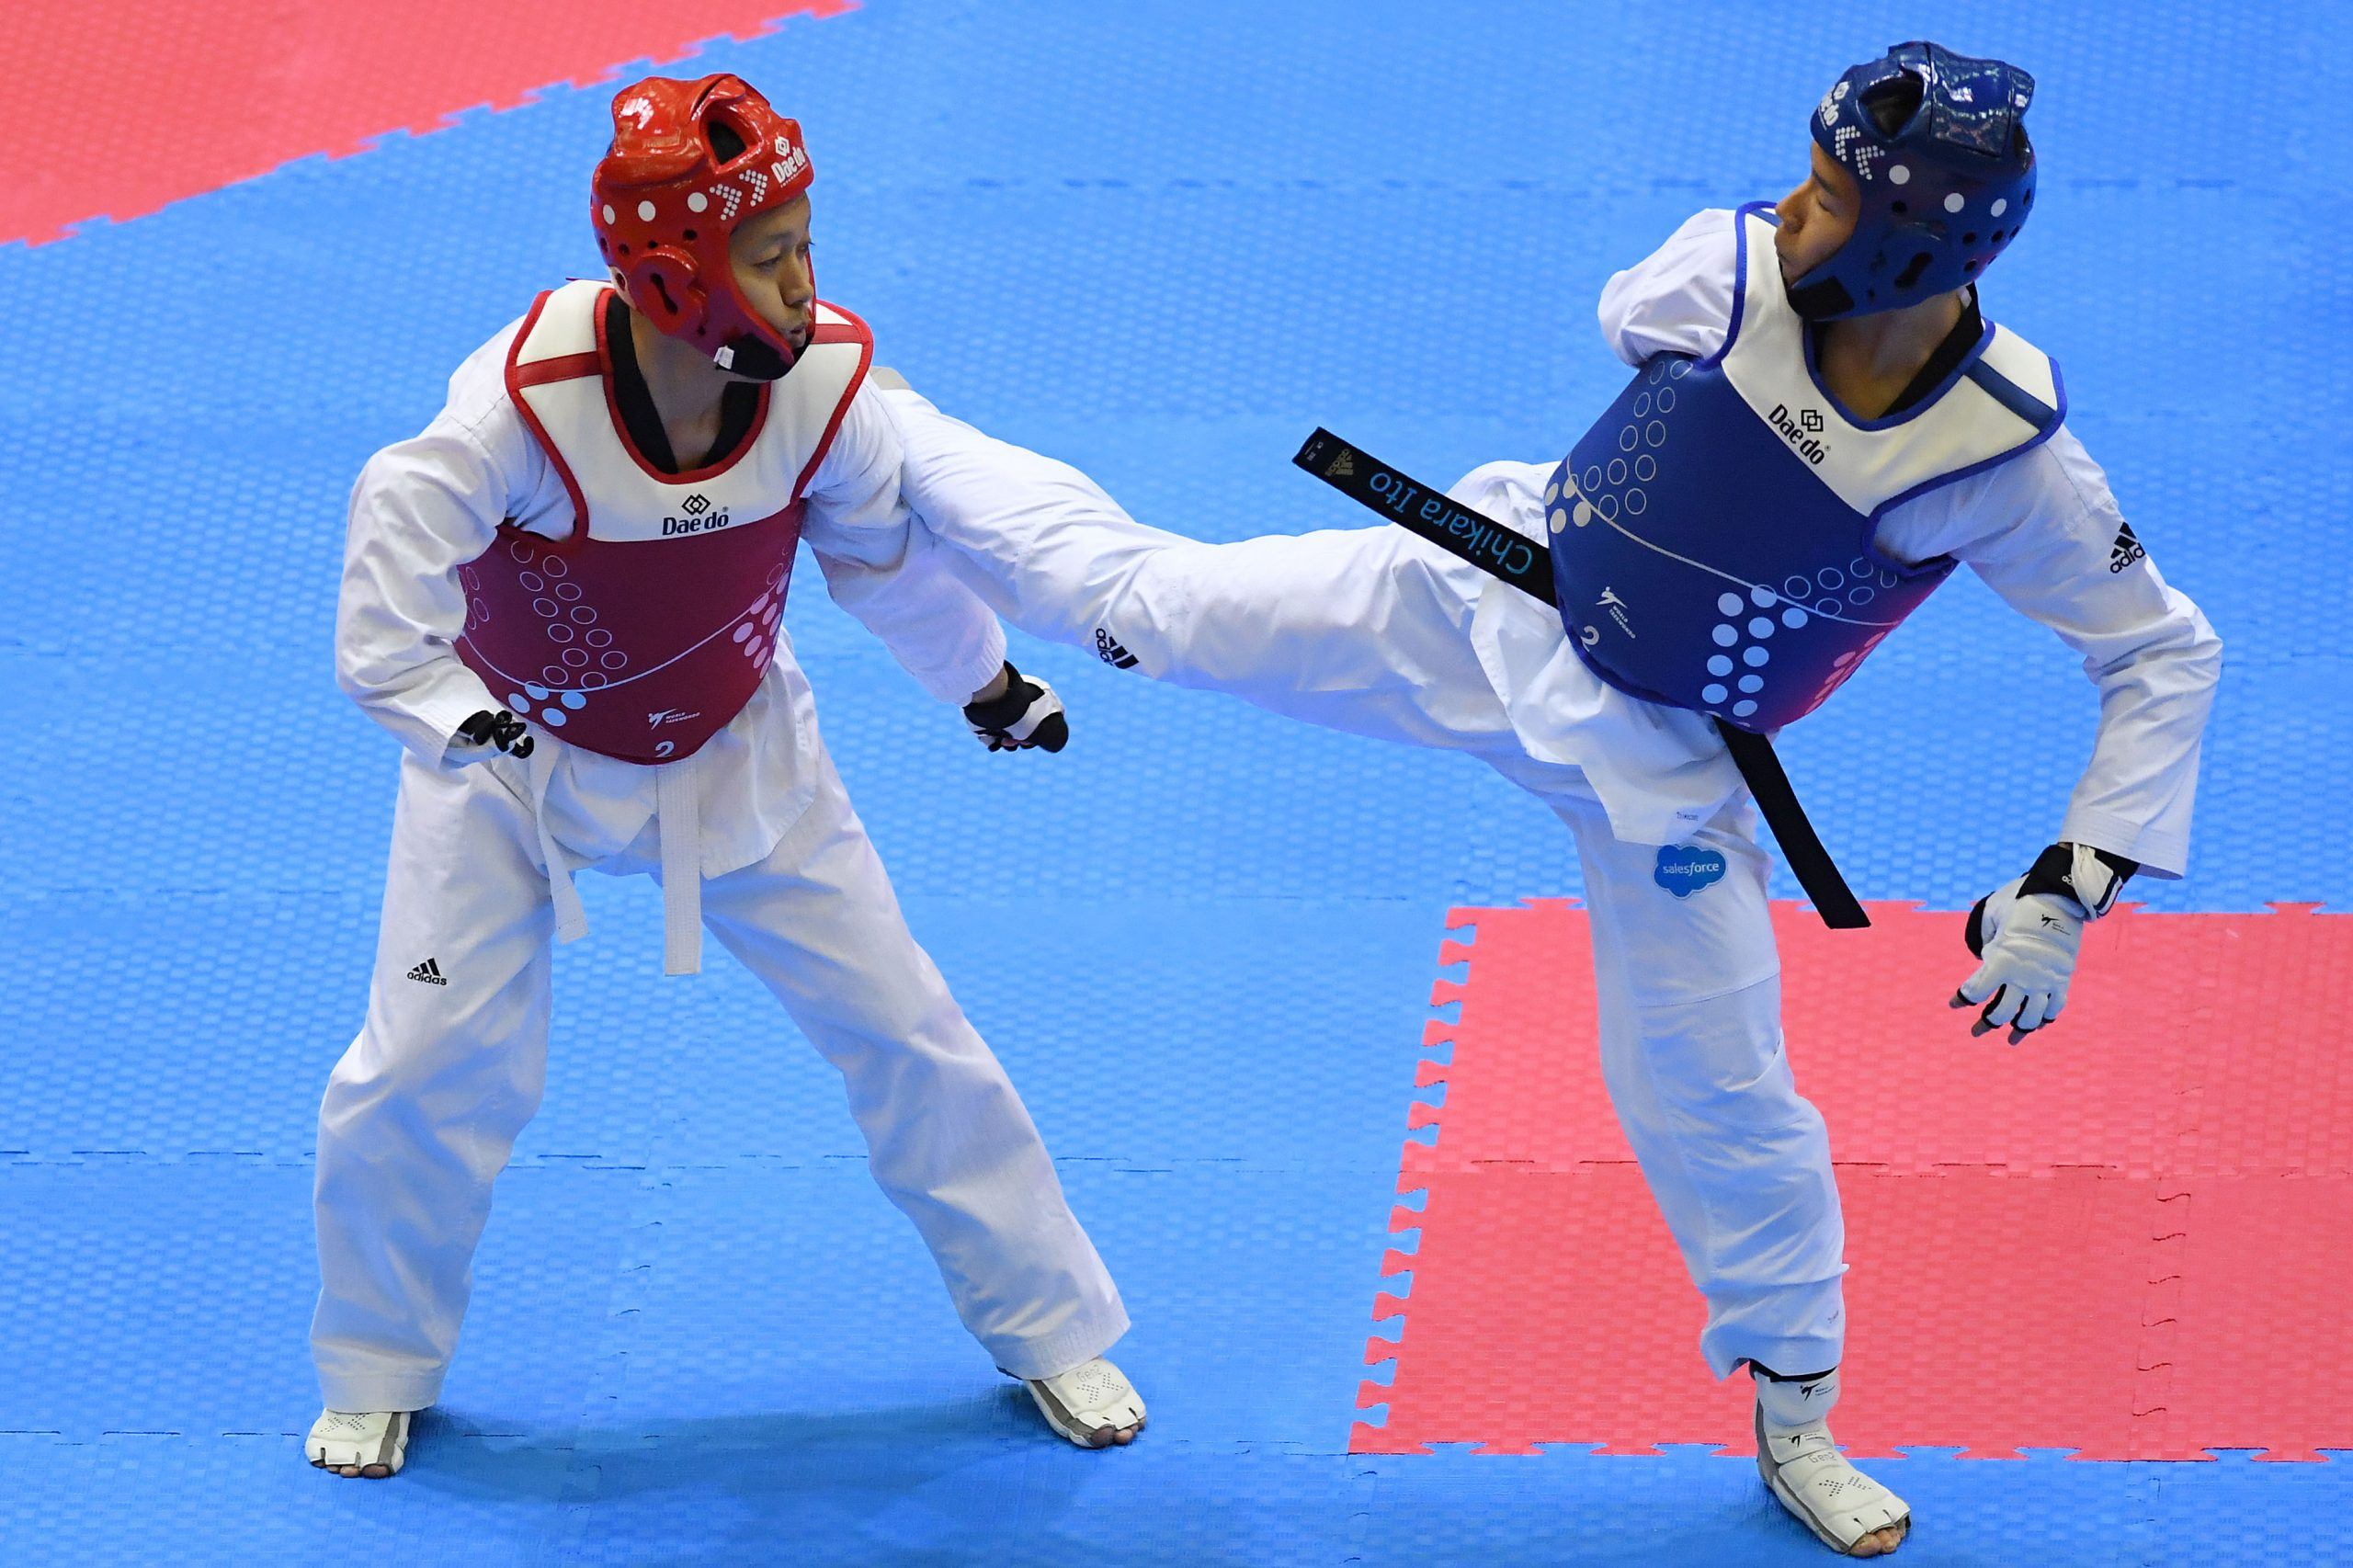 2 hommes combattent en para taekwondo